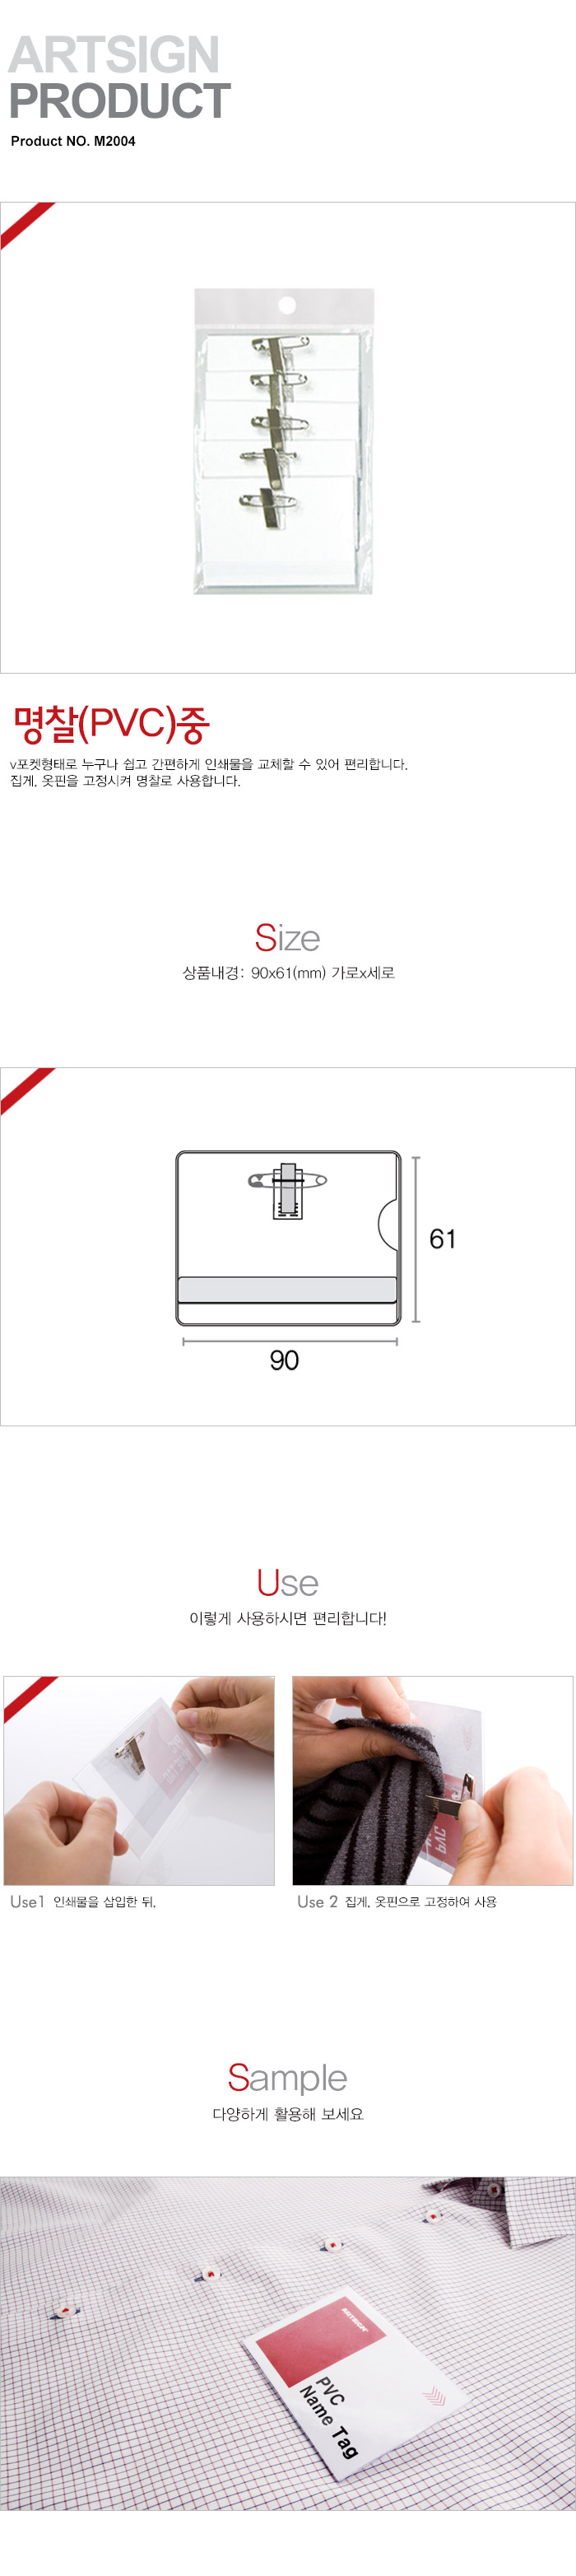 PVC명찰(중) M2004 - 아트사인, 2,000원, 네임택, 명찰/이름표